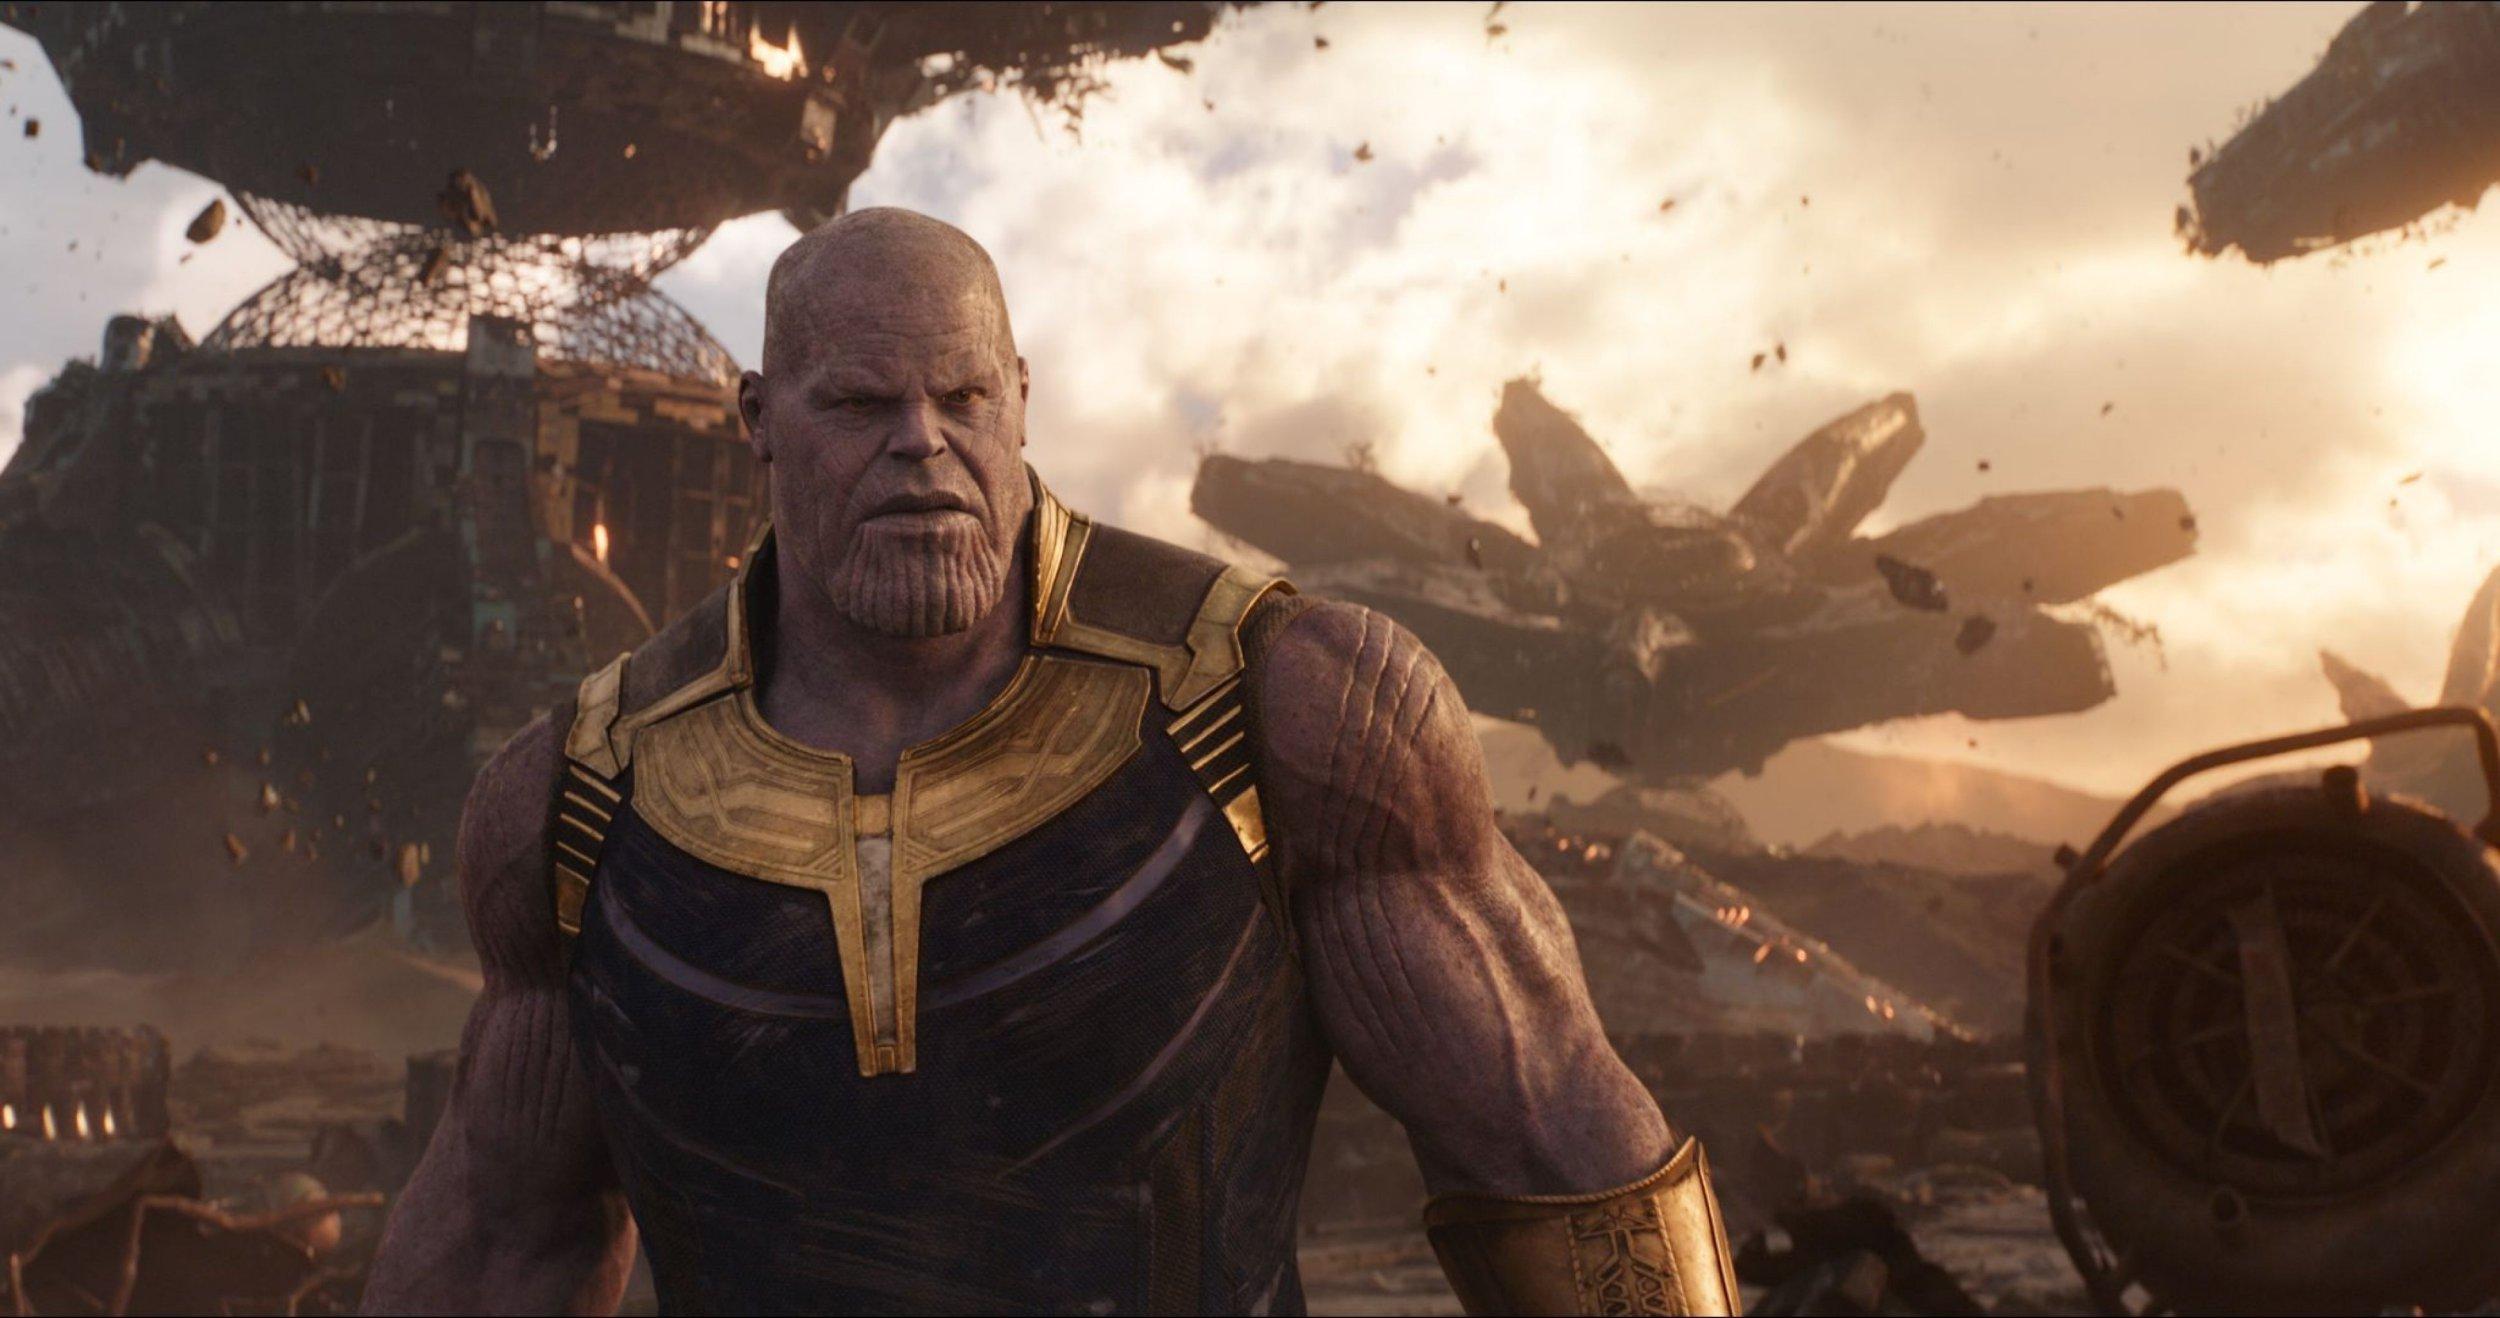 thanos as seen in avengers: infinity war